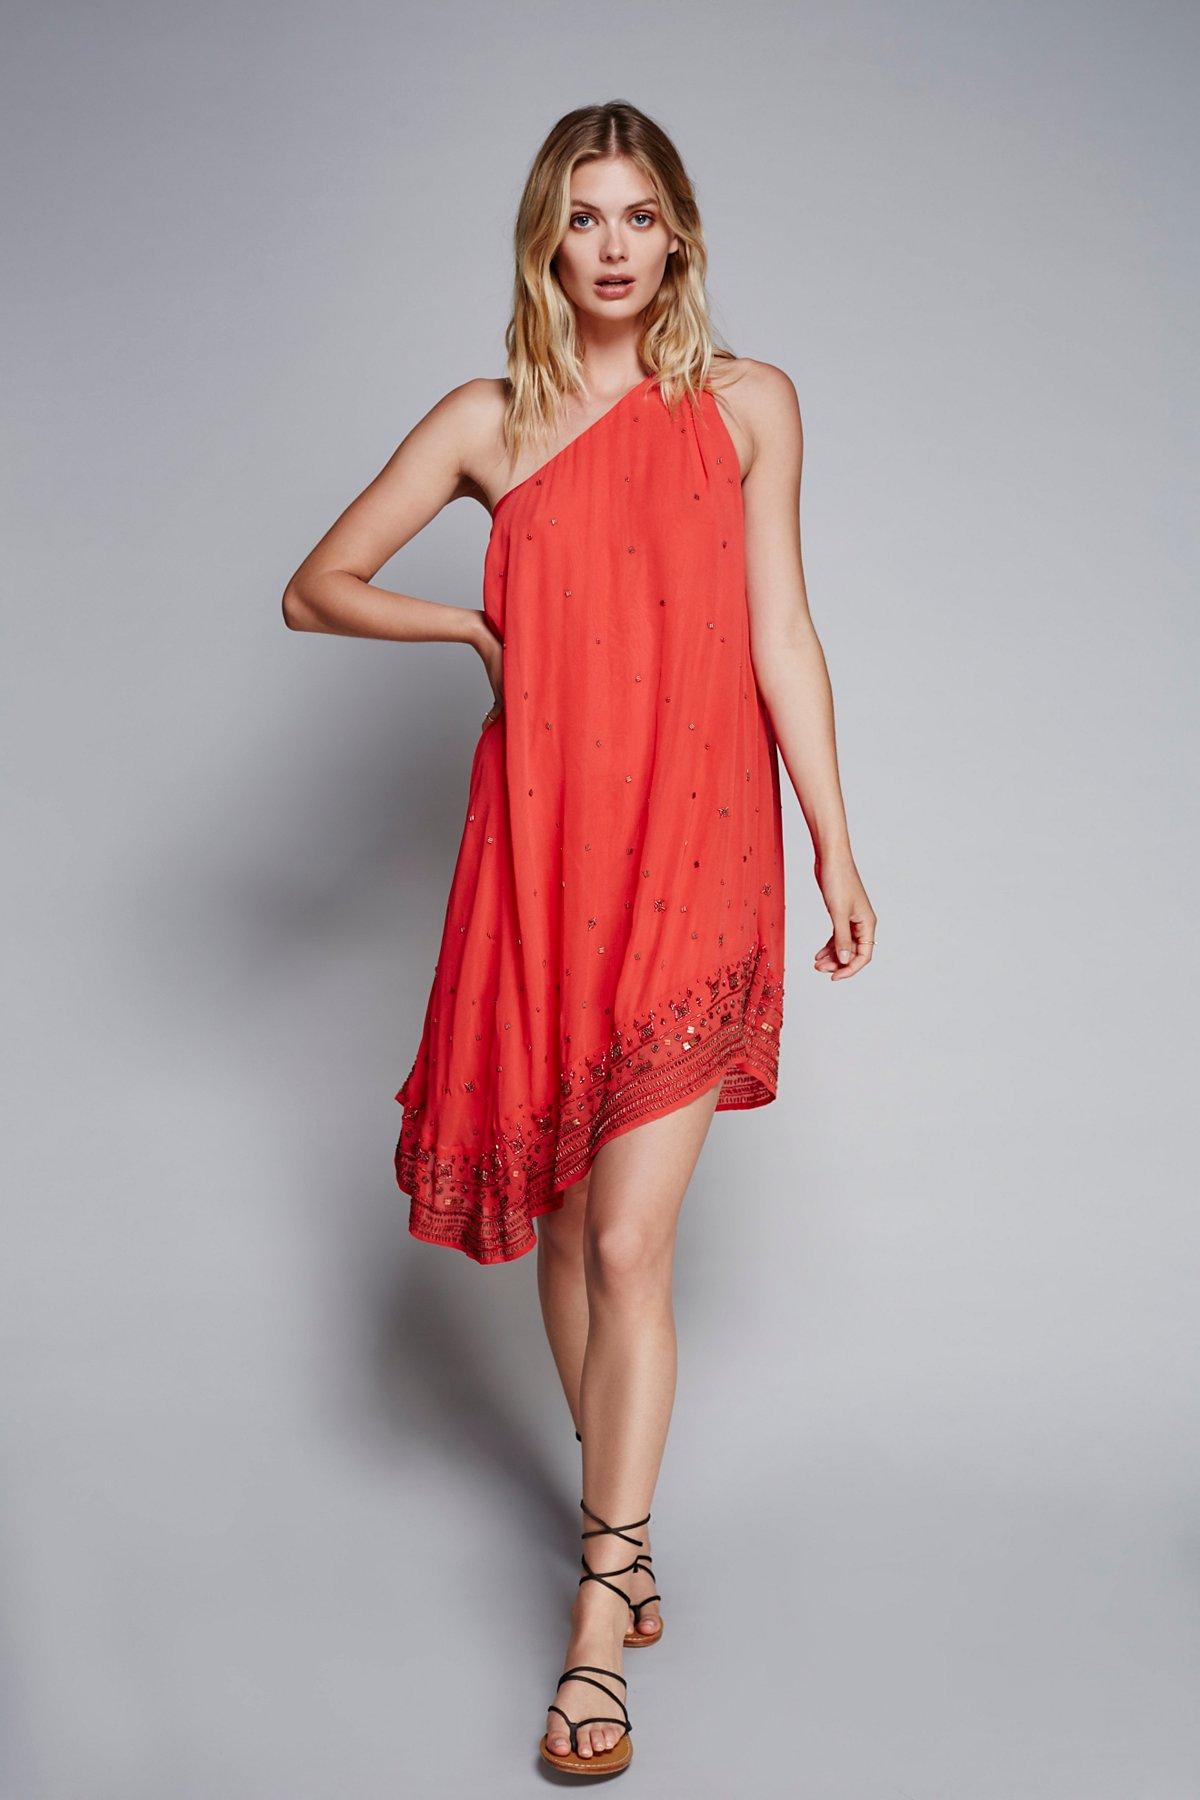 Starbright Mini Dress